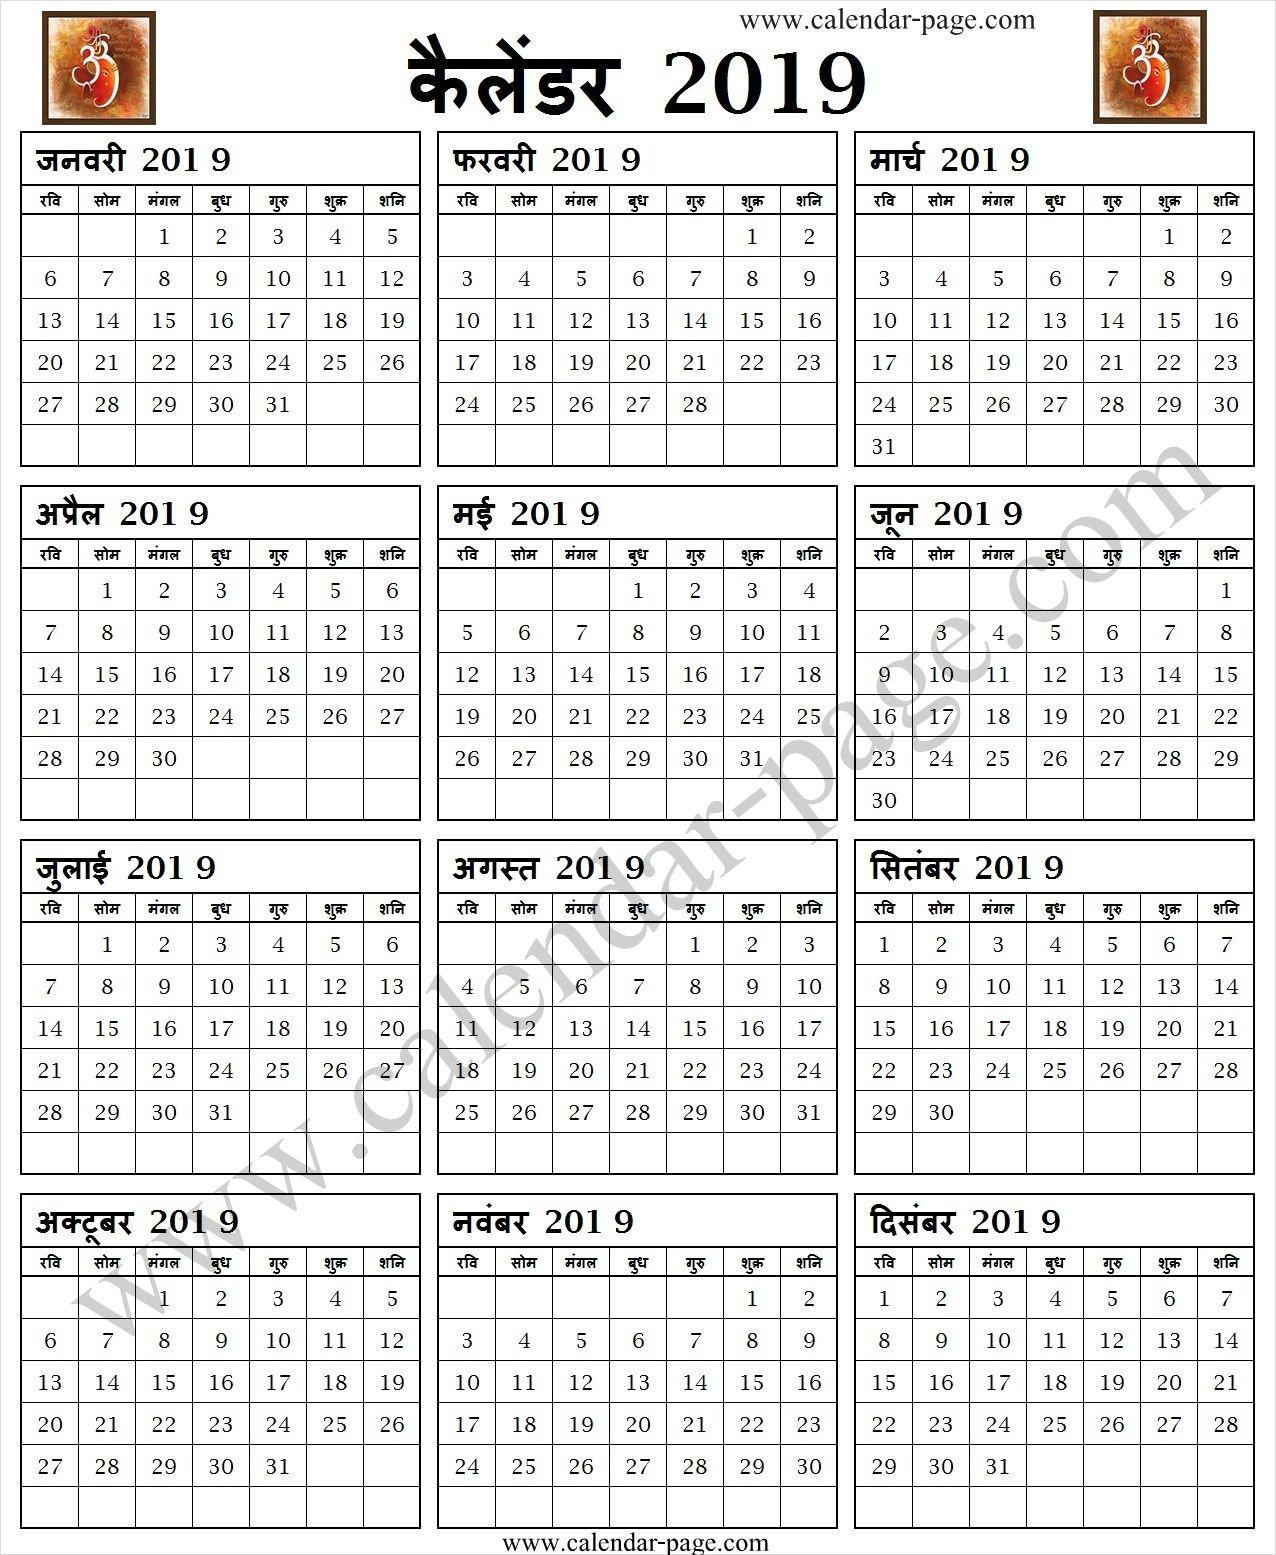 2019 Hindu Calendar In Hindi | 2019 Free Calendar To Print | 2019 Calendar 2019 Hindu